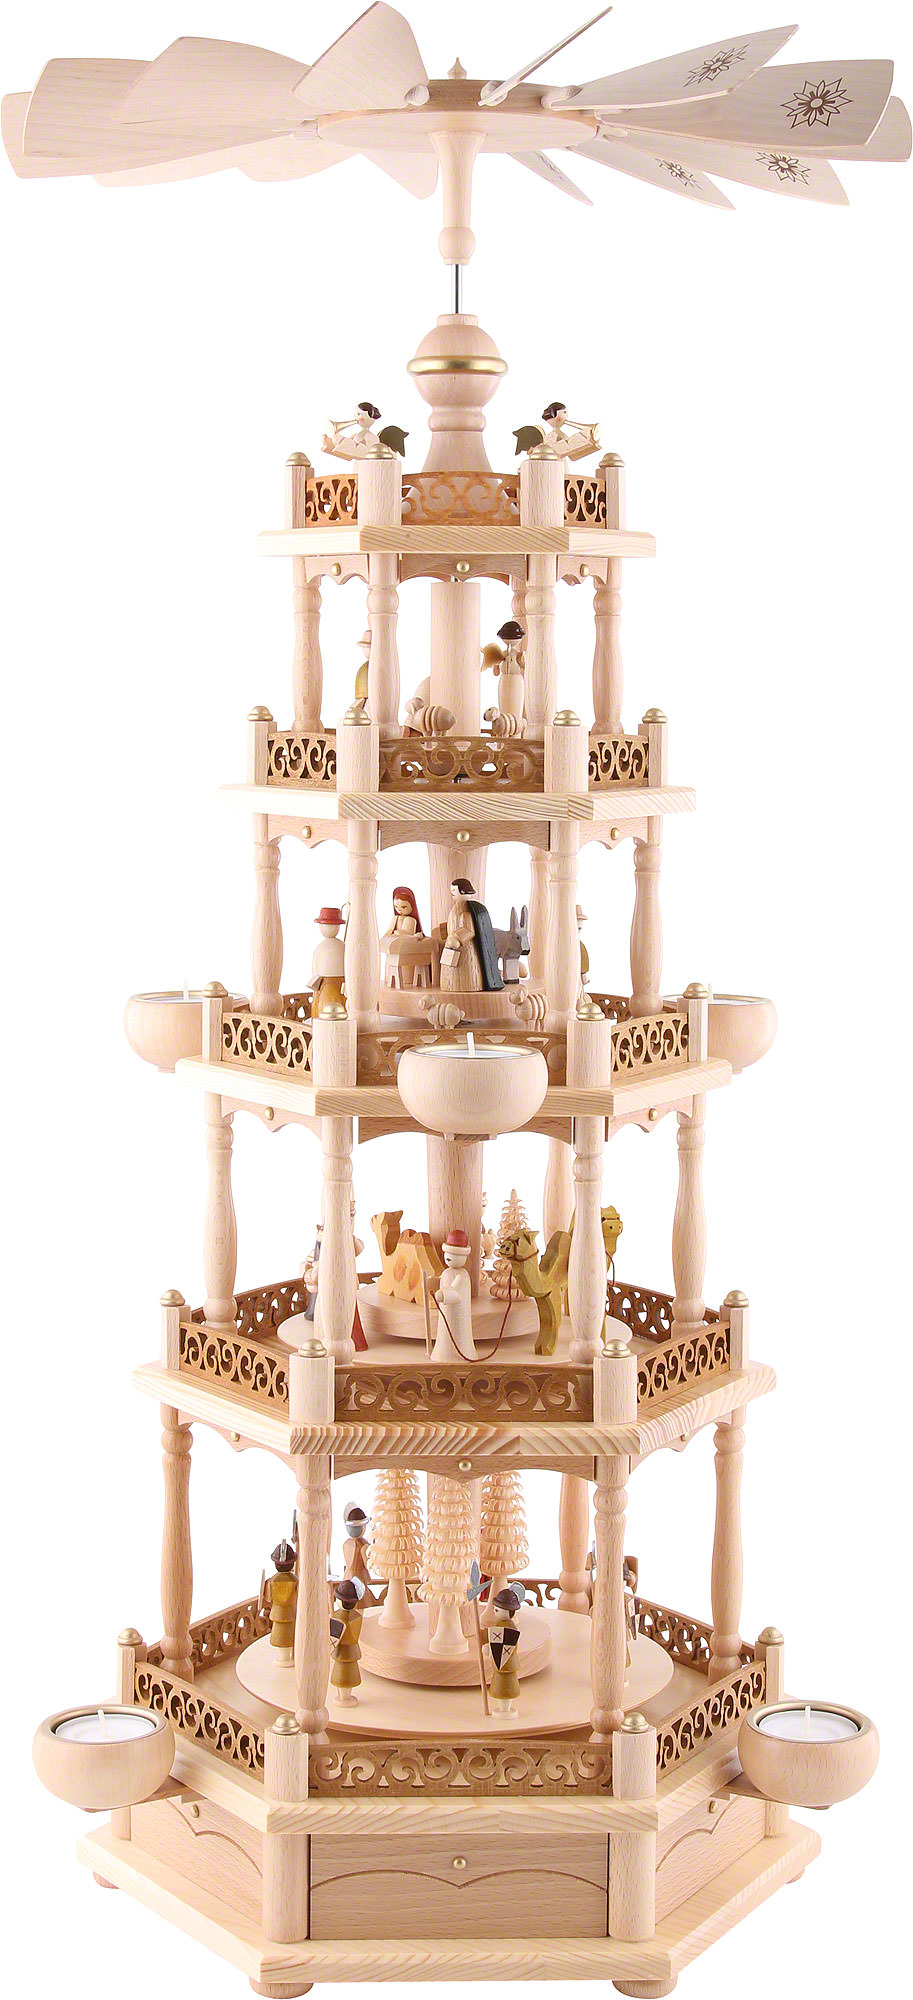 5 tier pyramid nativity 74 cm 30in by richard gl sser. Black Bedroom Furniture Sets. Home Design Ideas